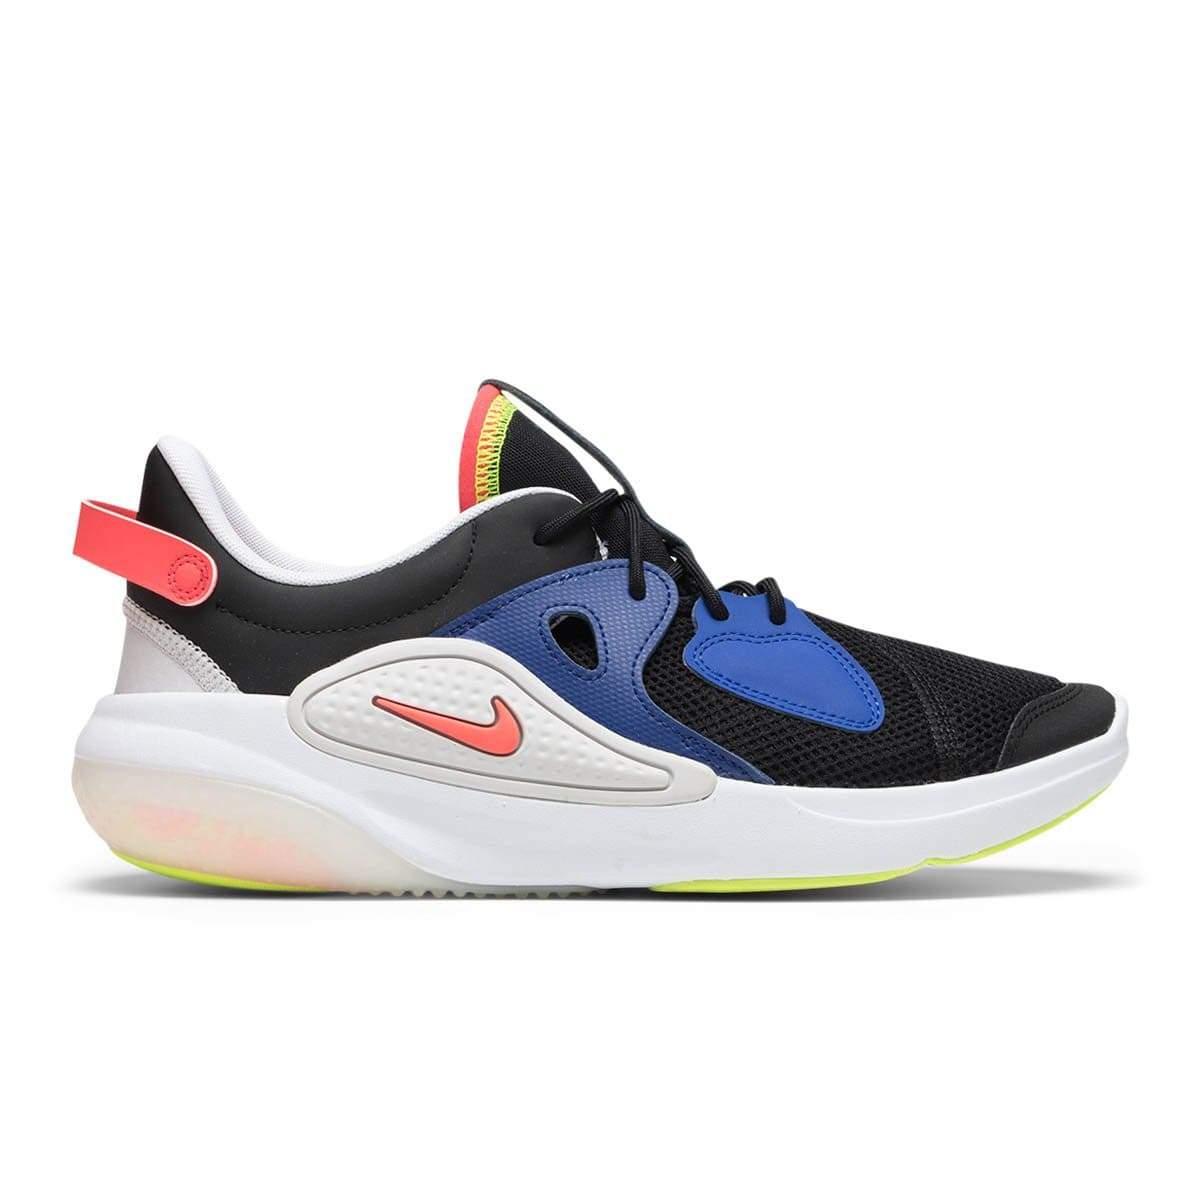 Nike Joyride CC now online at Bodega -  #nike #bodega #bdgastore